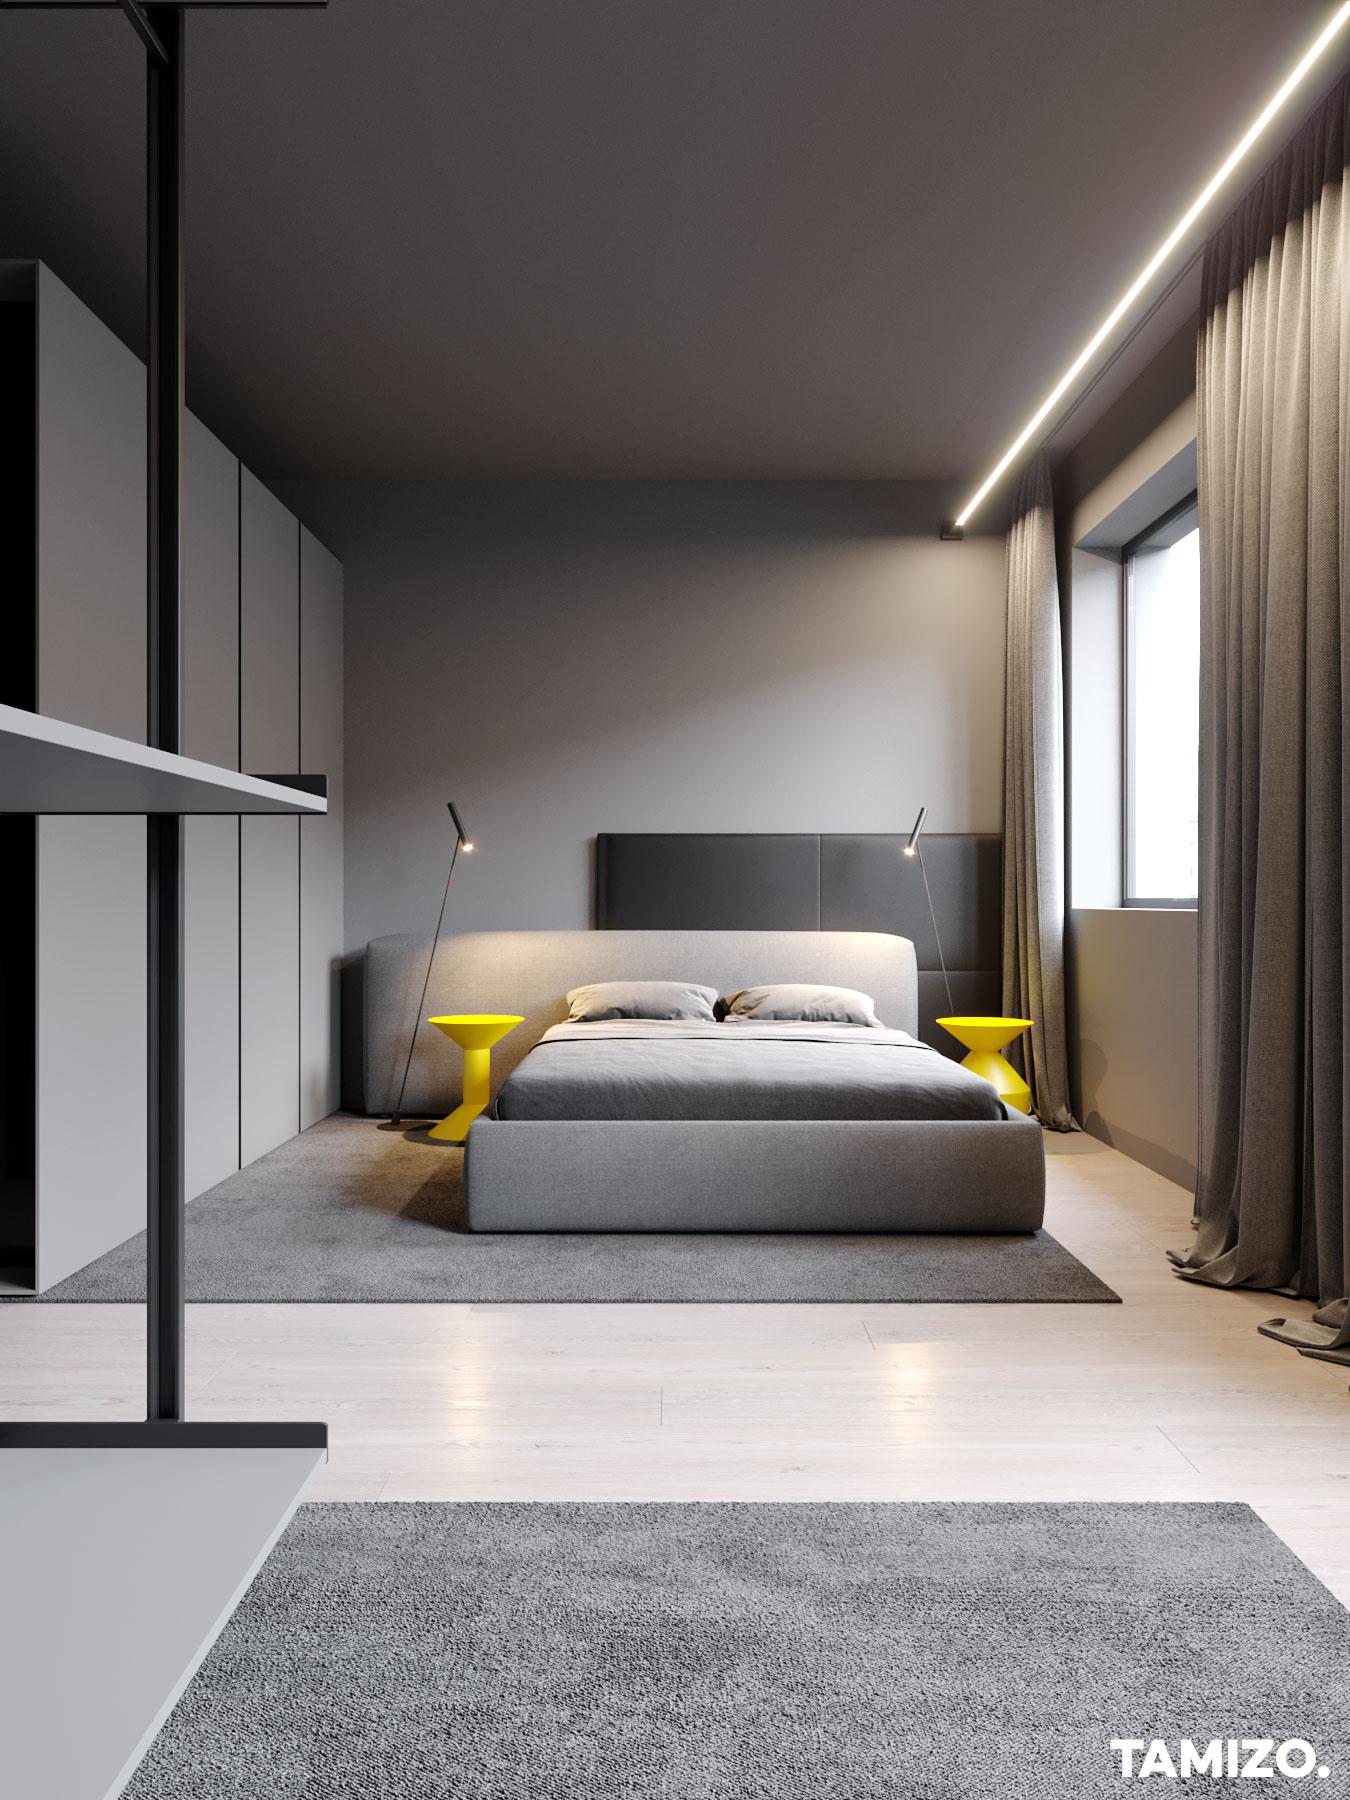 tamizo_interior_wnetrza_projekt_architekci_mateusz_kuo_stolarski_lodz_12